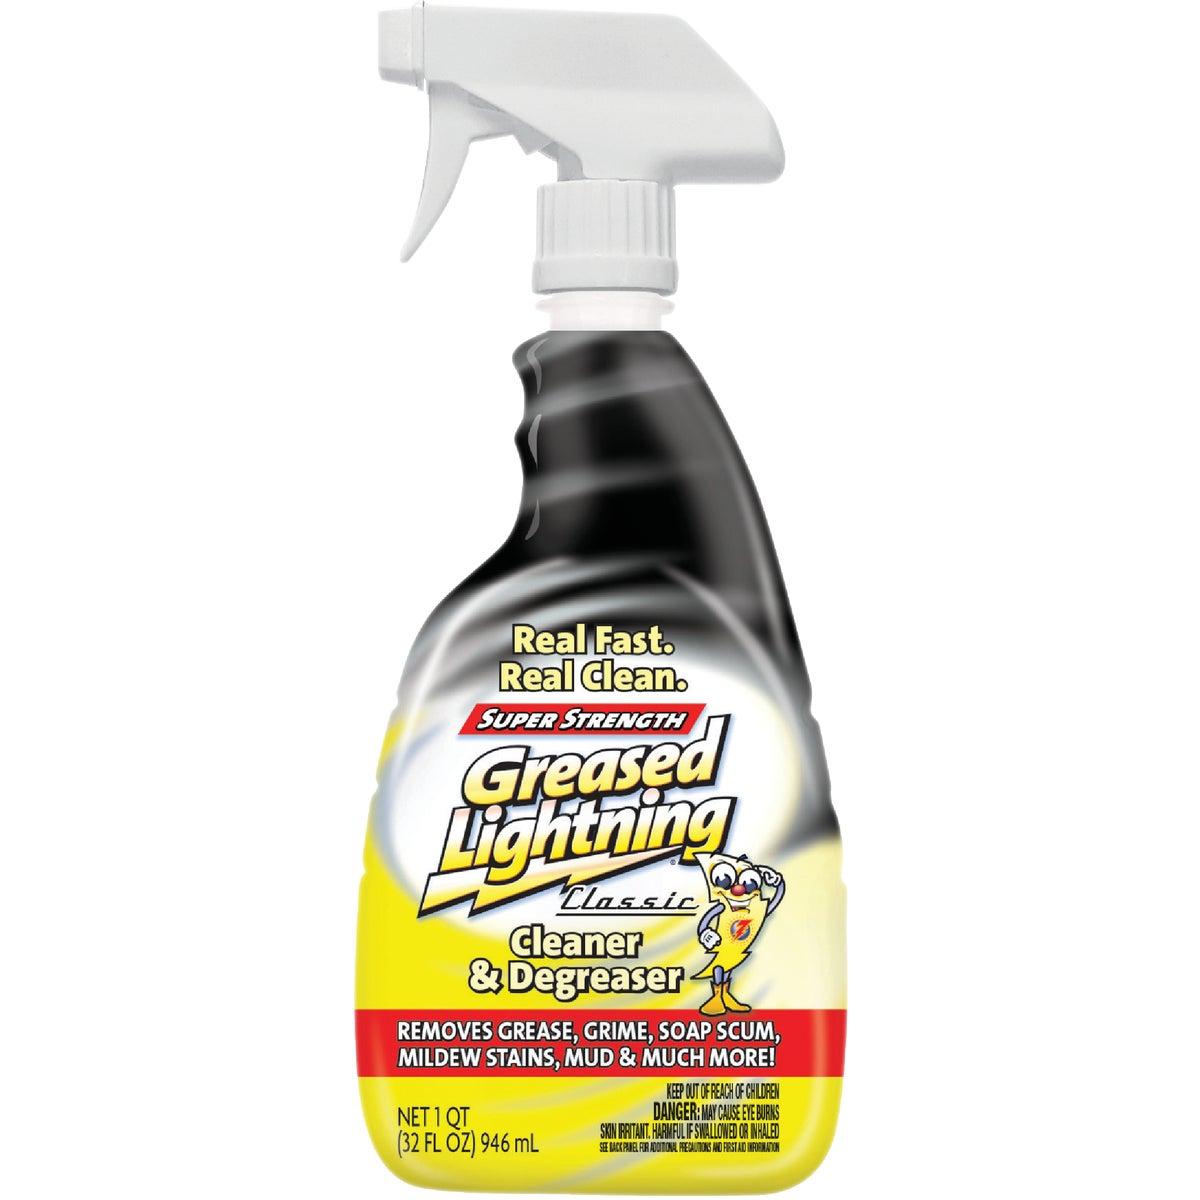 Greased Lightning 32 Oz. Classic Cleaner & Degreaser